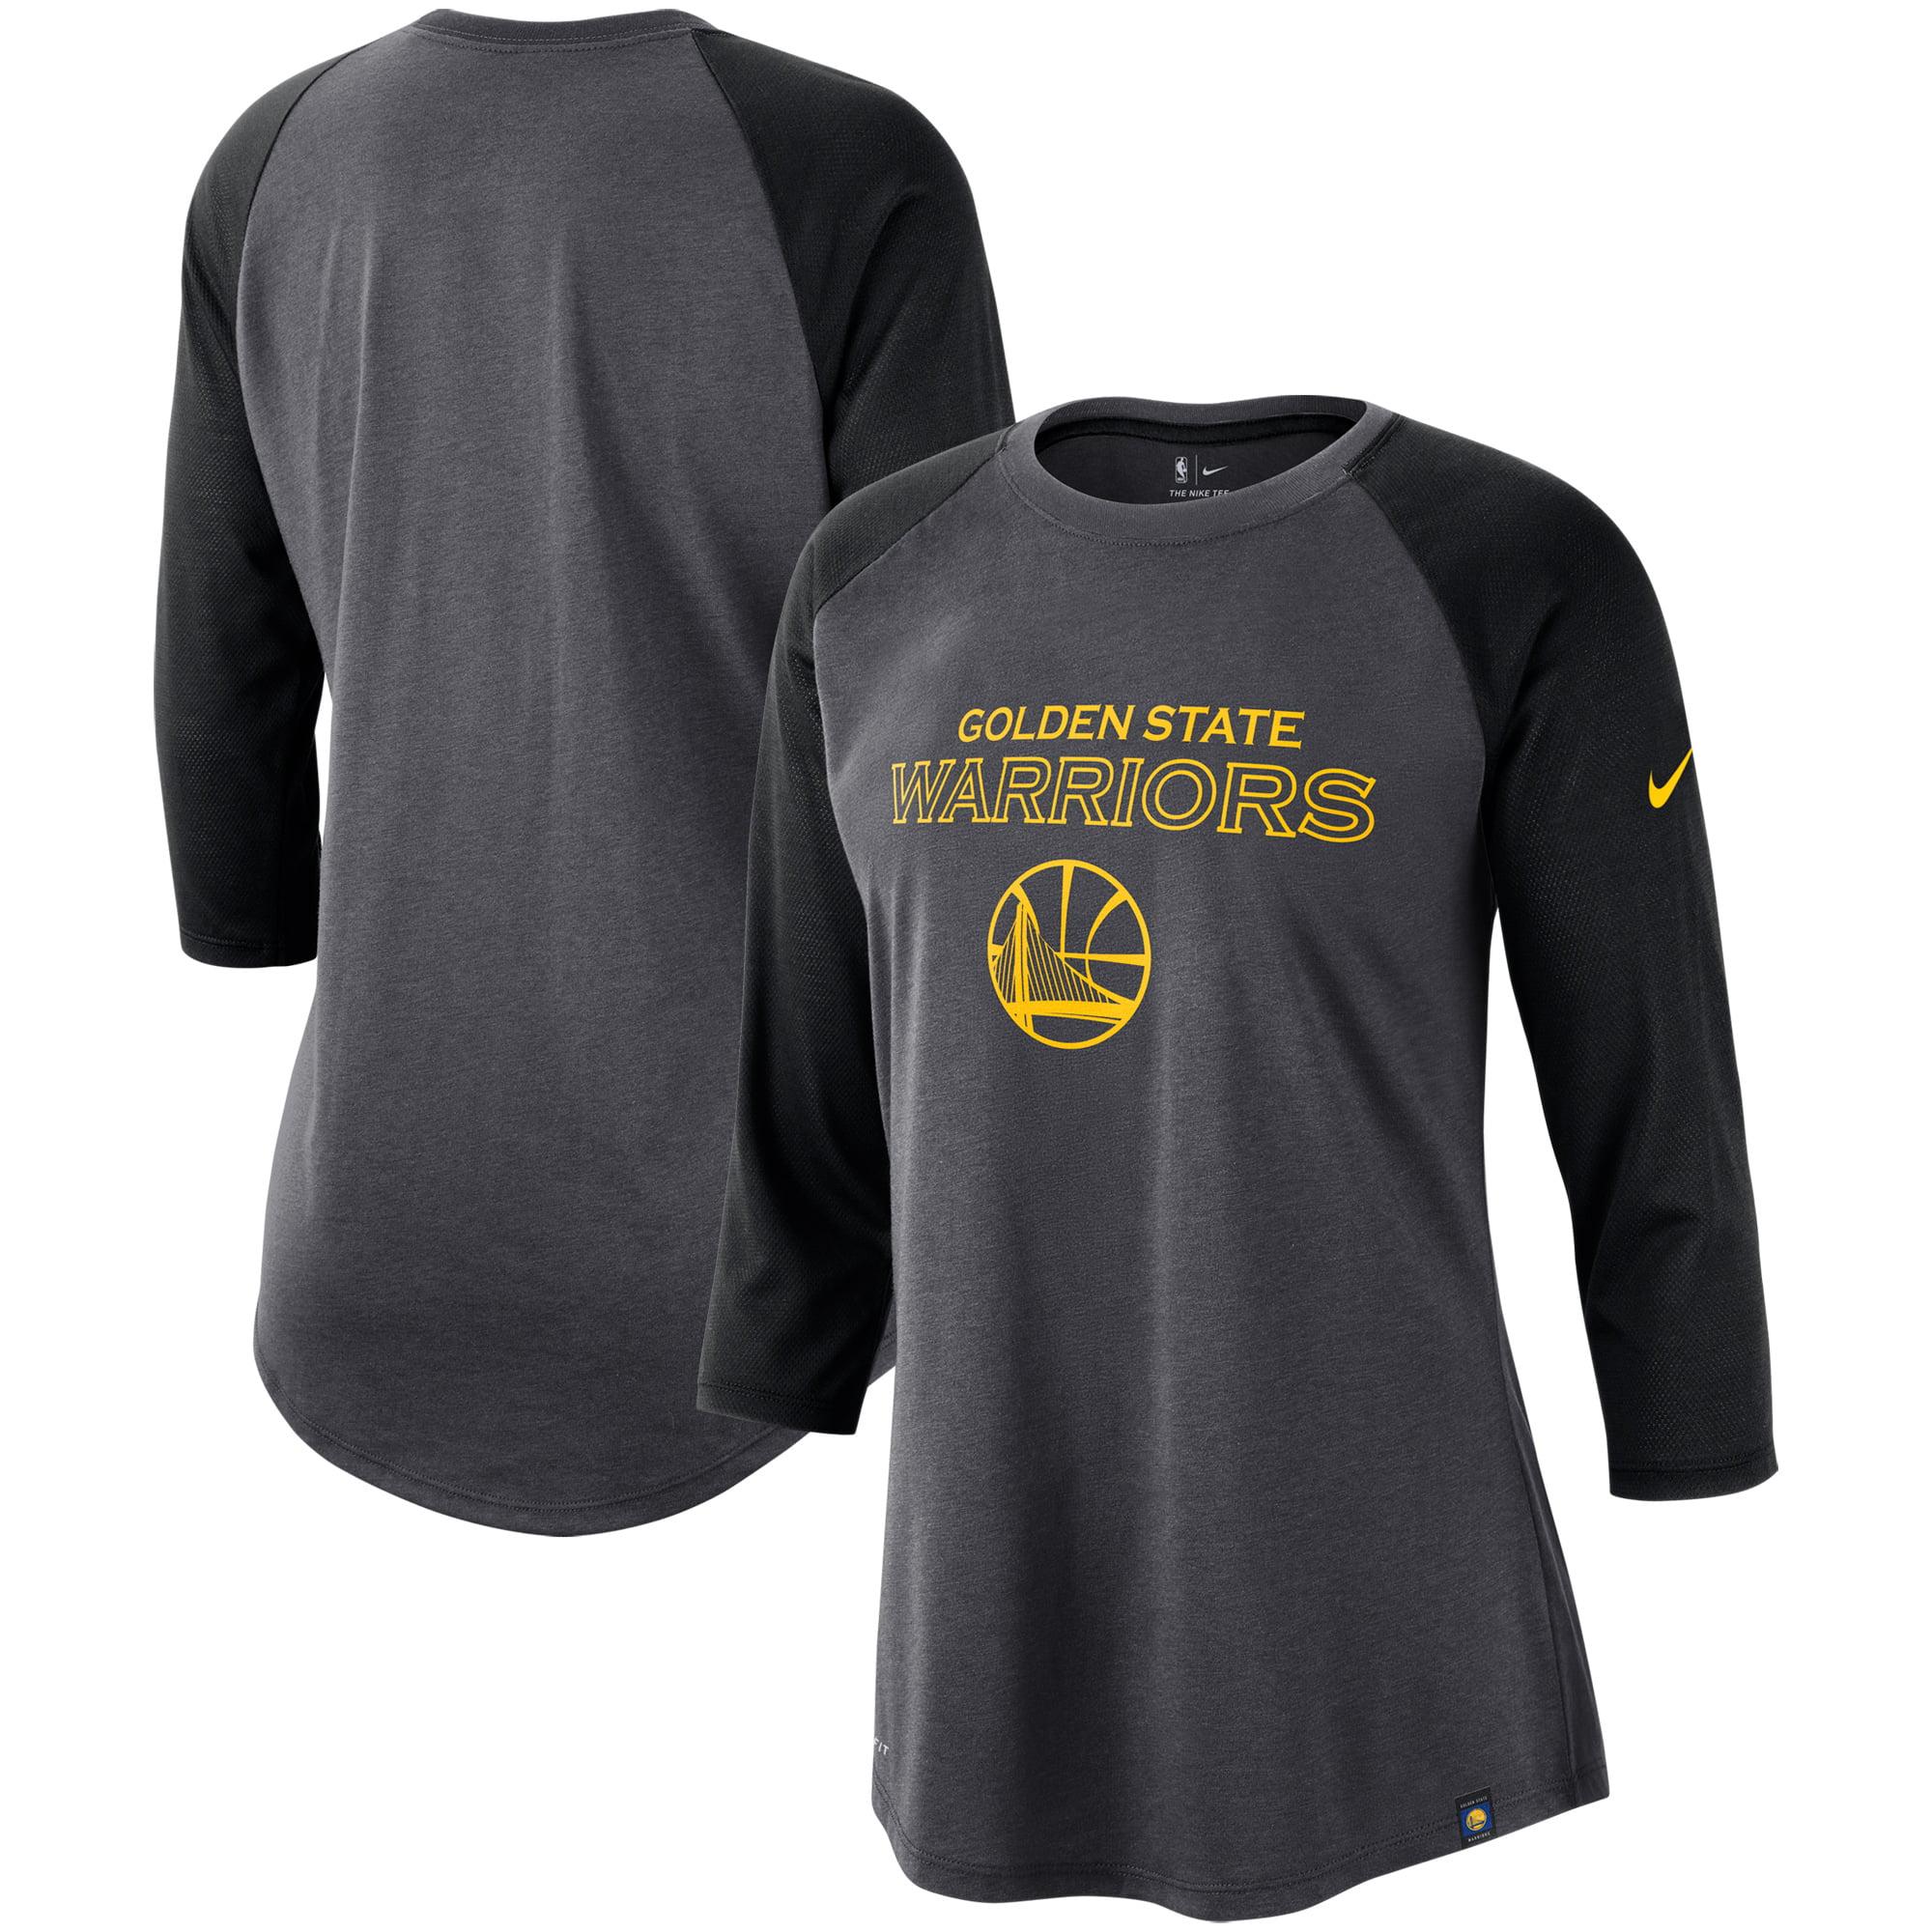 Golden State Warriors Nike Women's Wordmark Logo Performance 3/4-Sleeve Raglan T-Shirt - Charcoal/Black